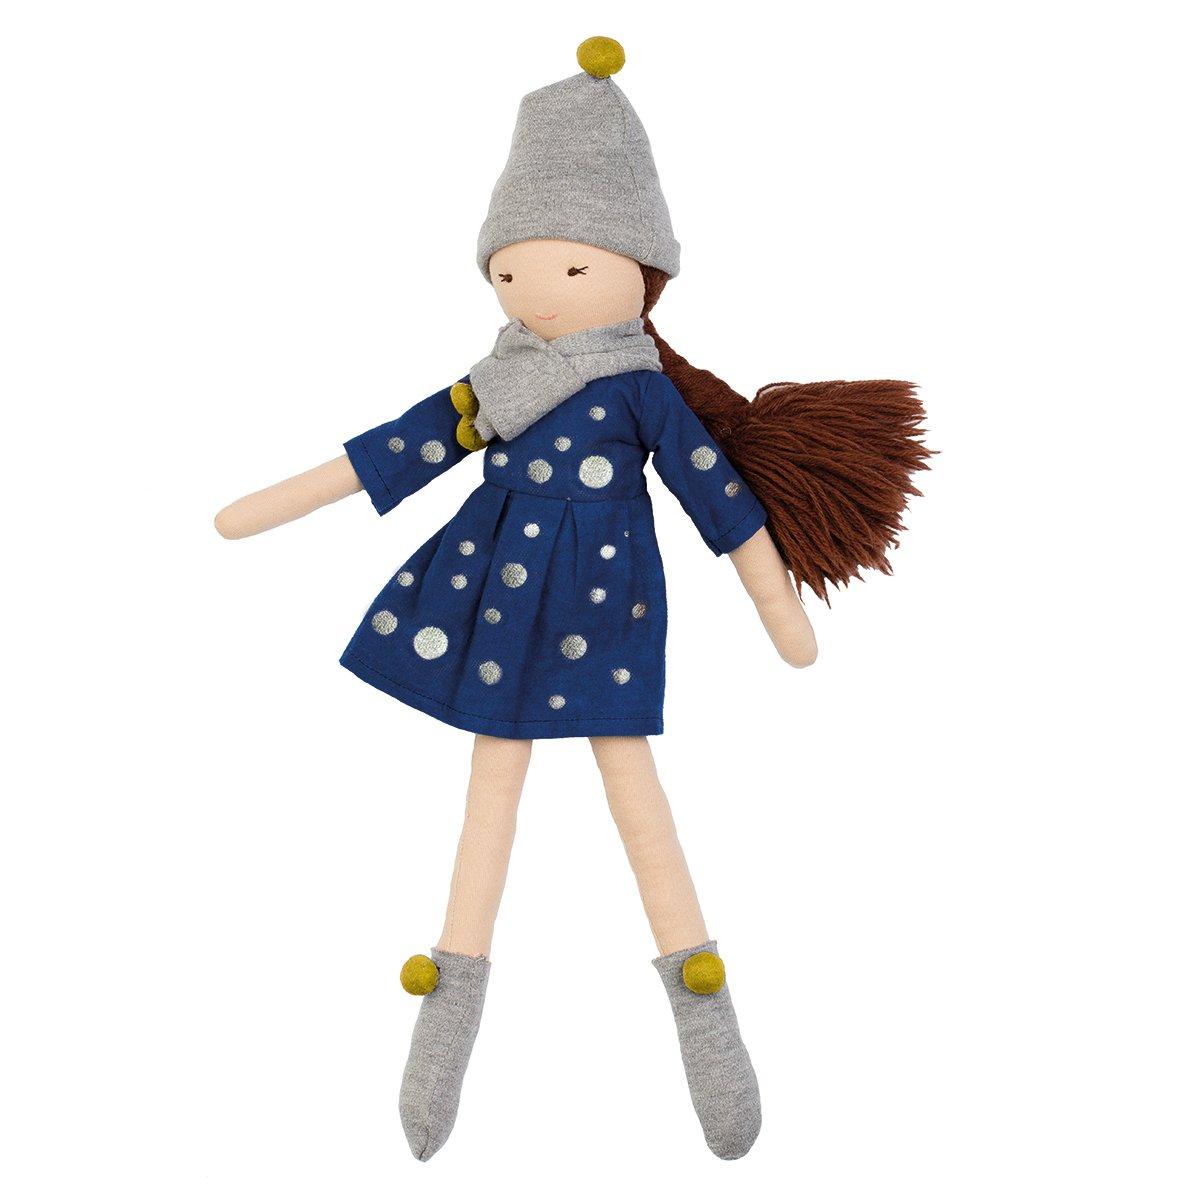 Character doll - Mia